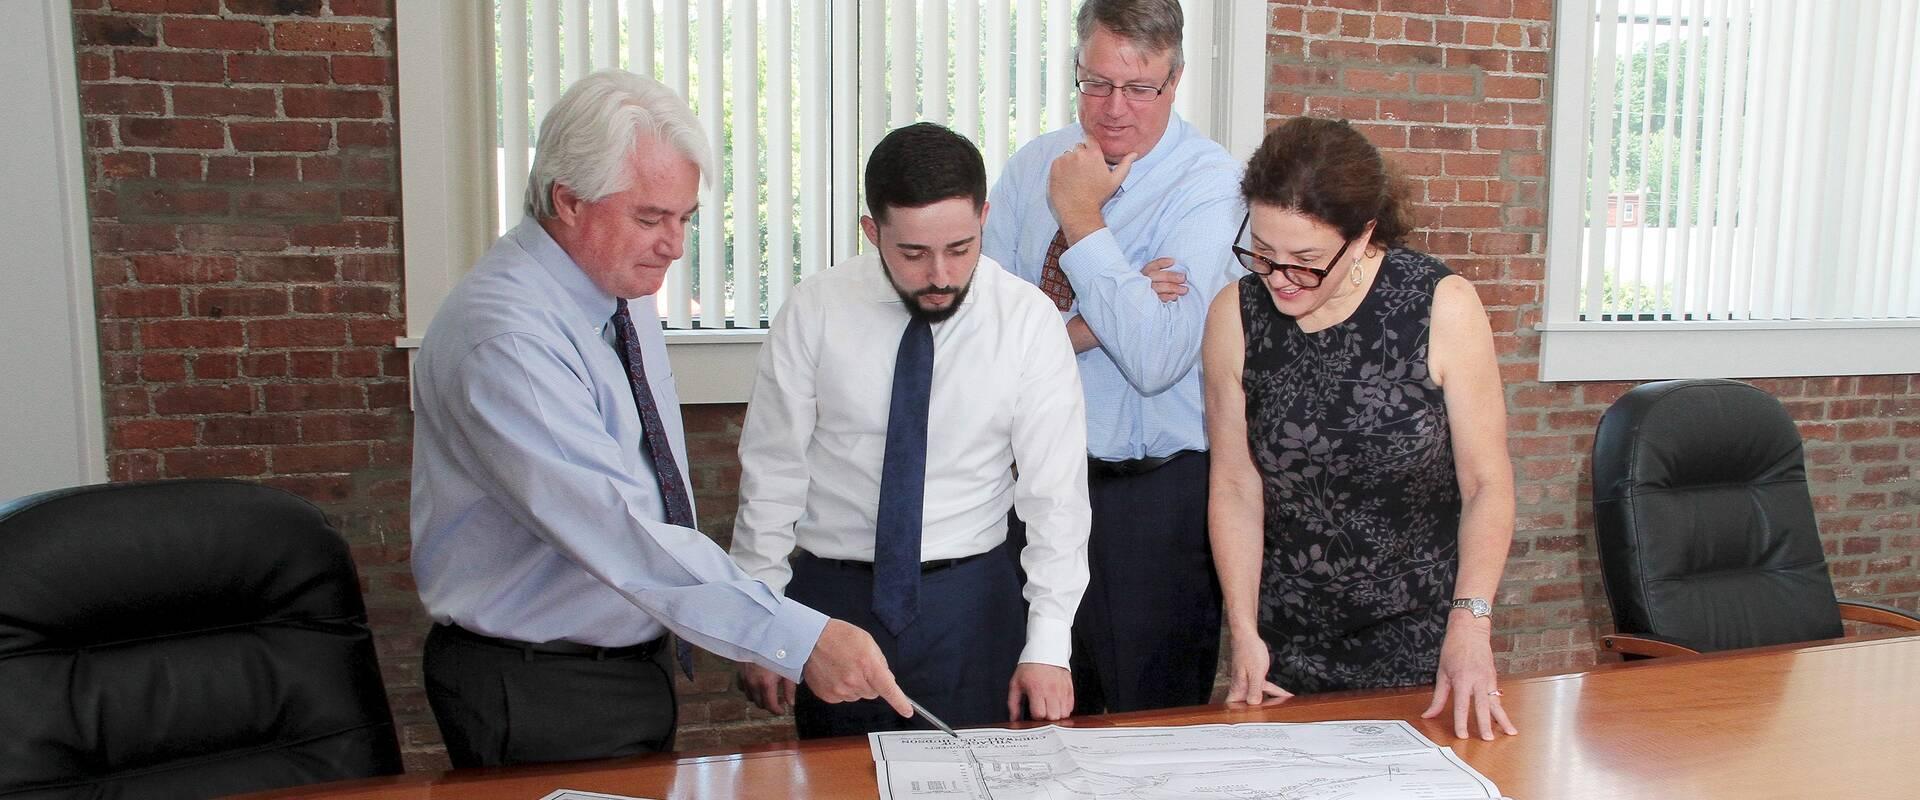 Land Use and Property Development